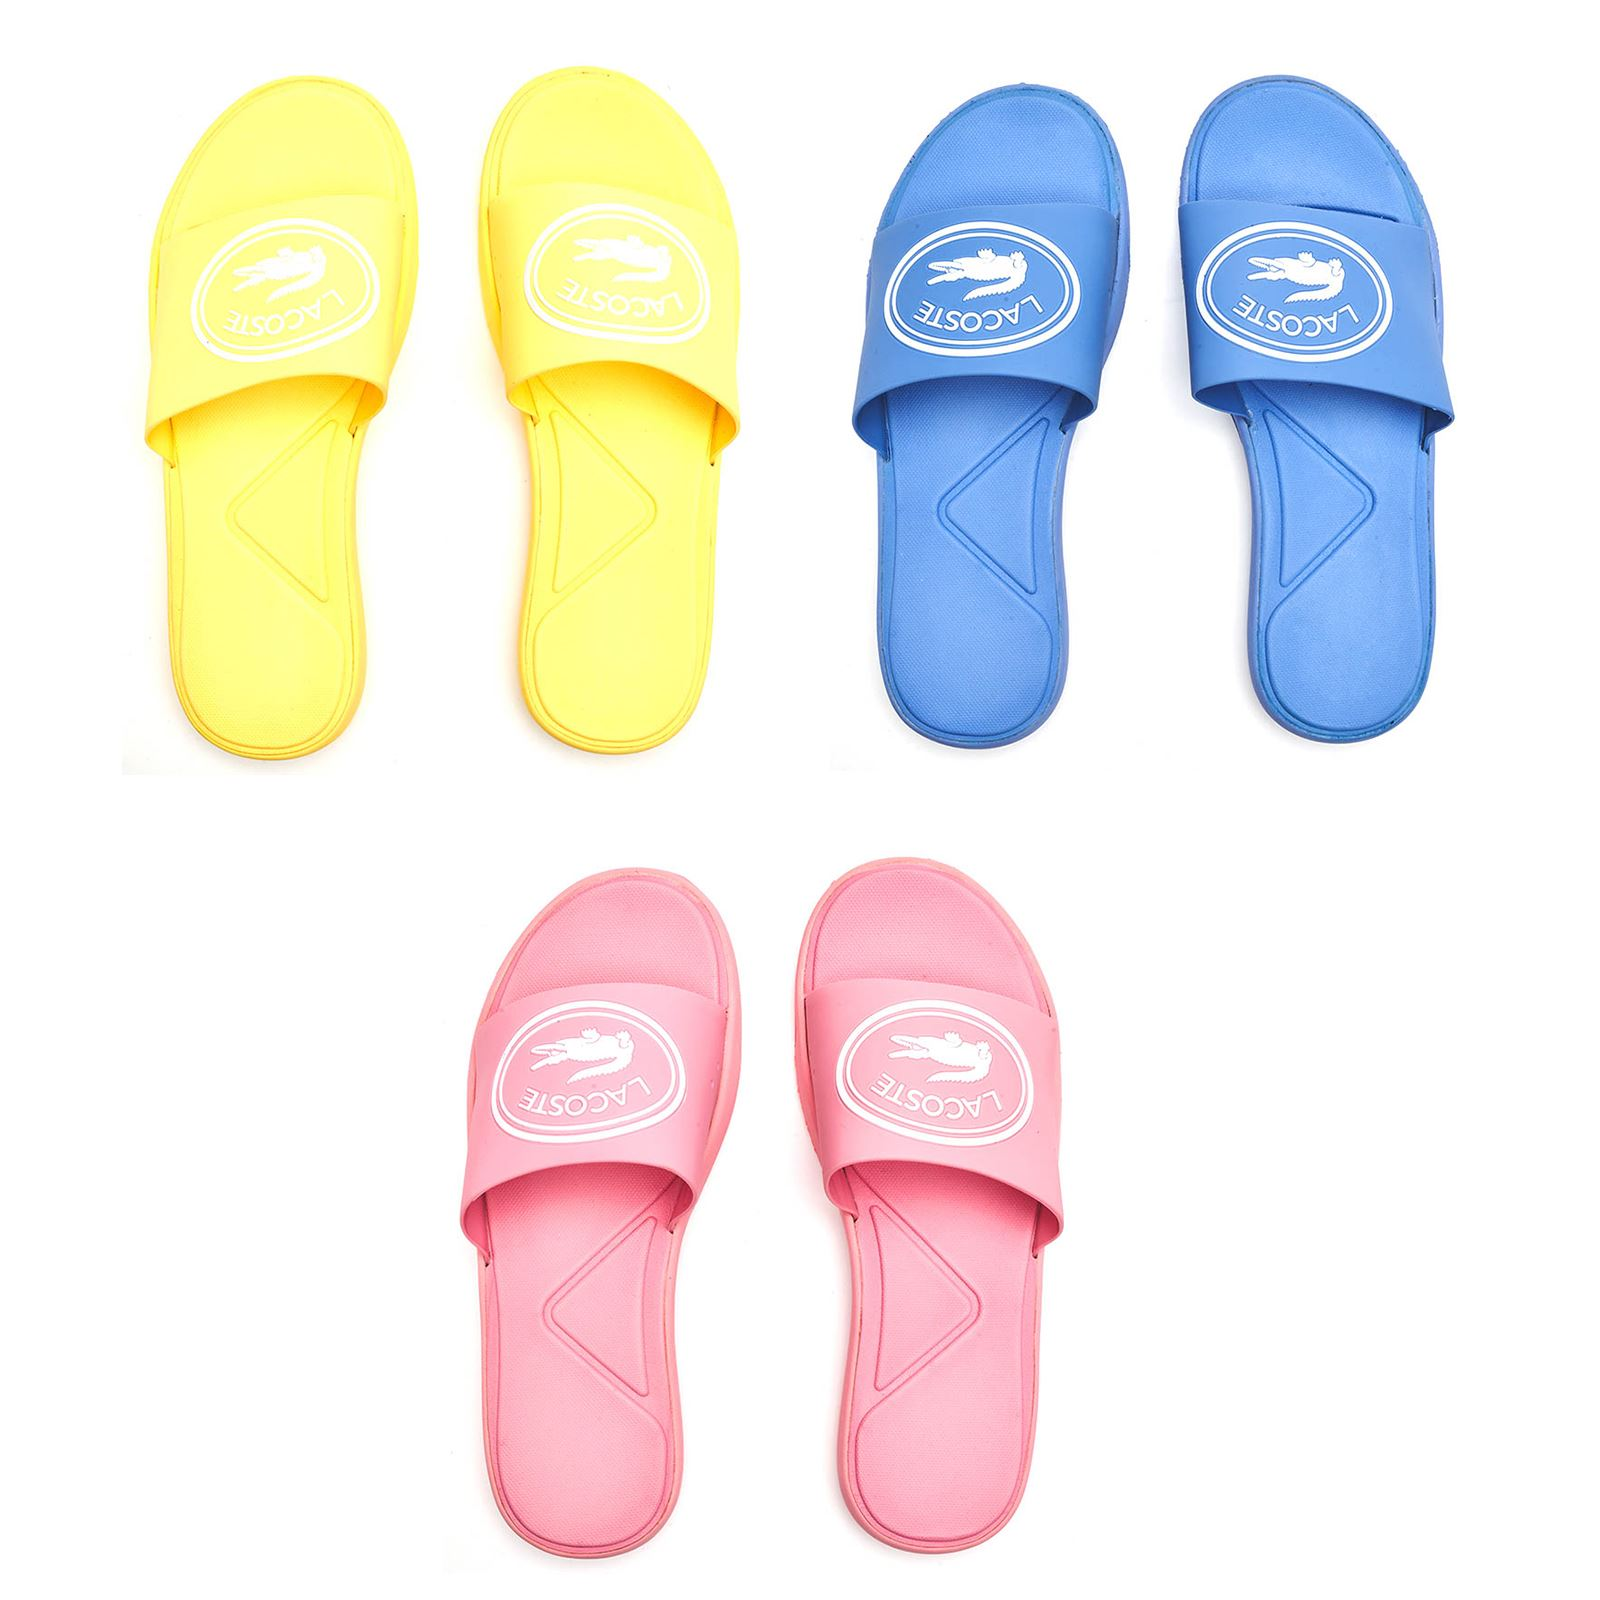 119 Cfa In L Slide 2 Playa Piscina 30 Lacoste Azul Pastel Sandalias wn0k8OP